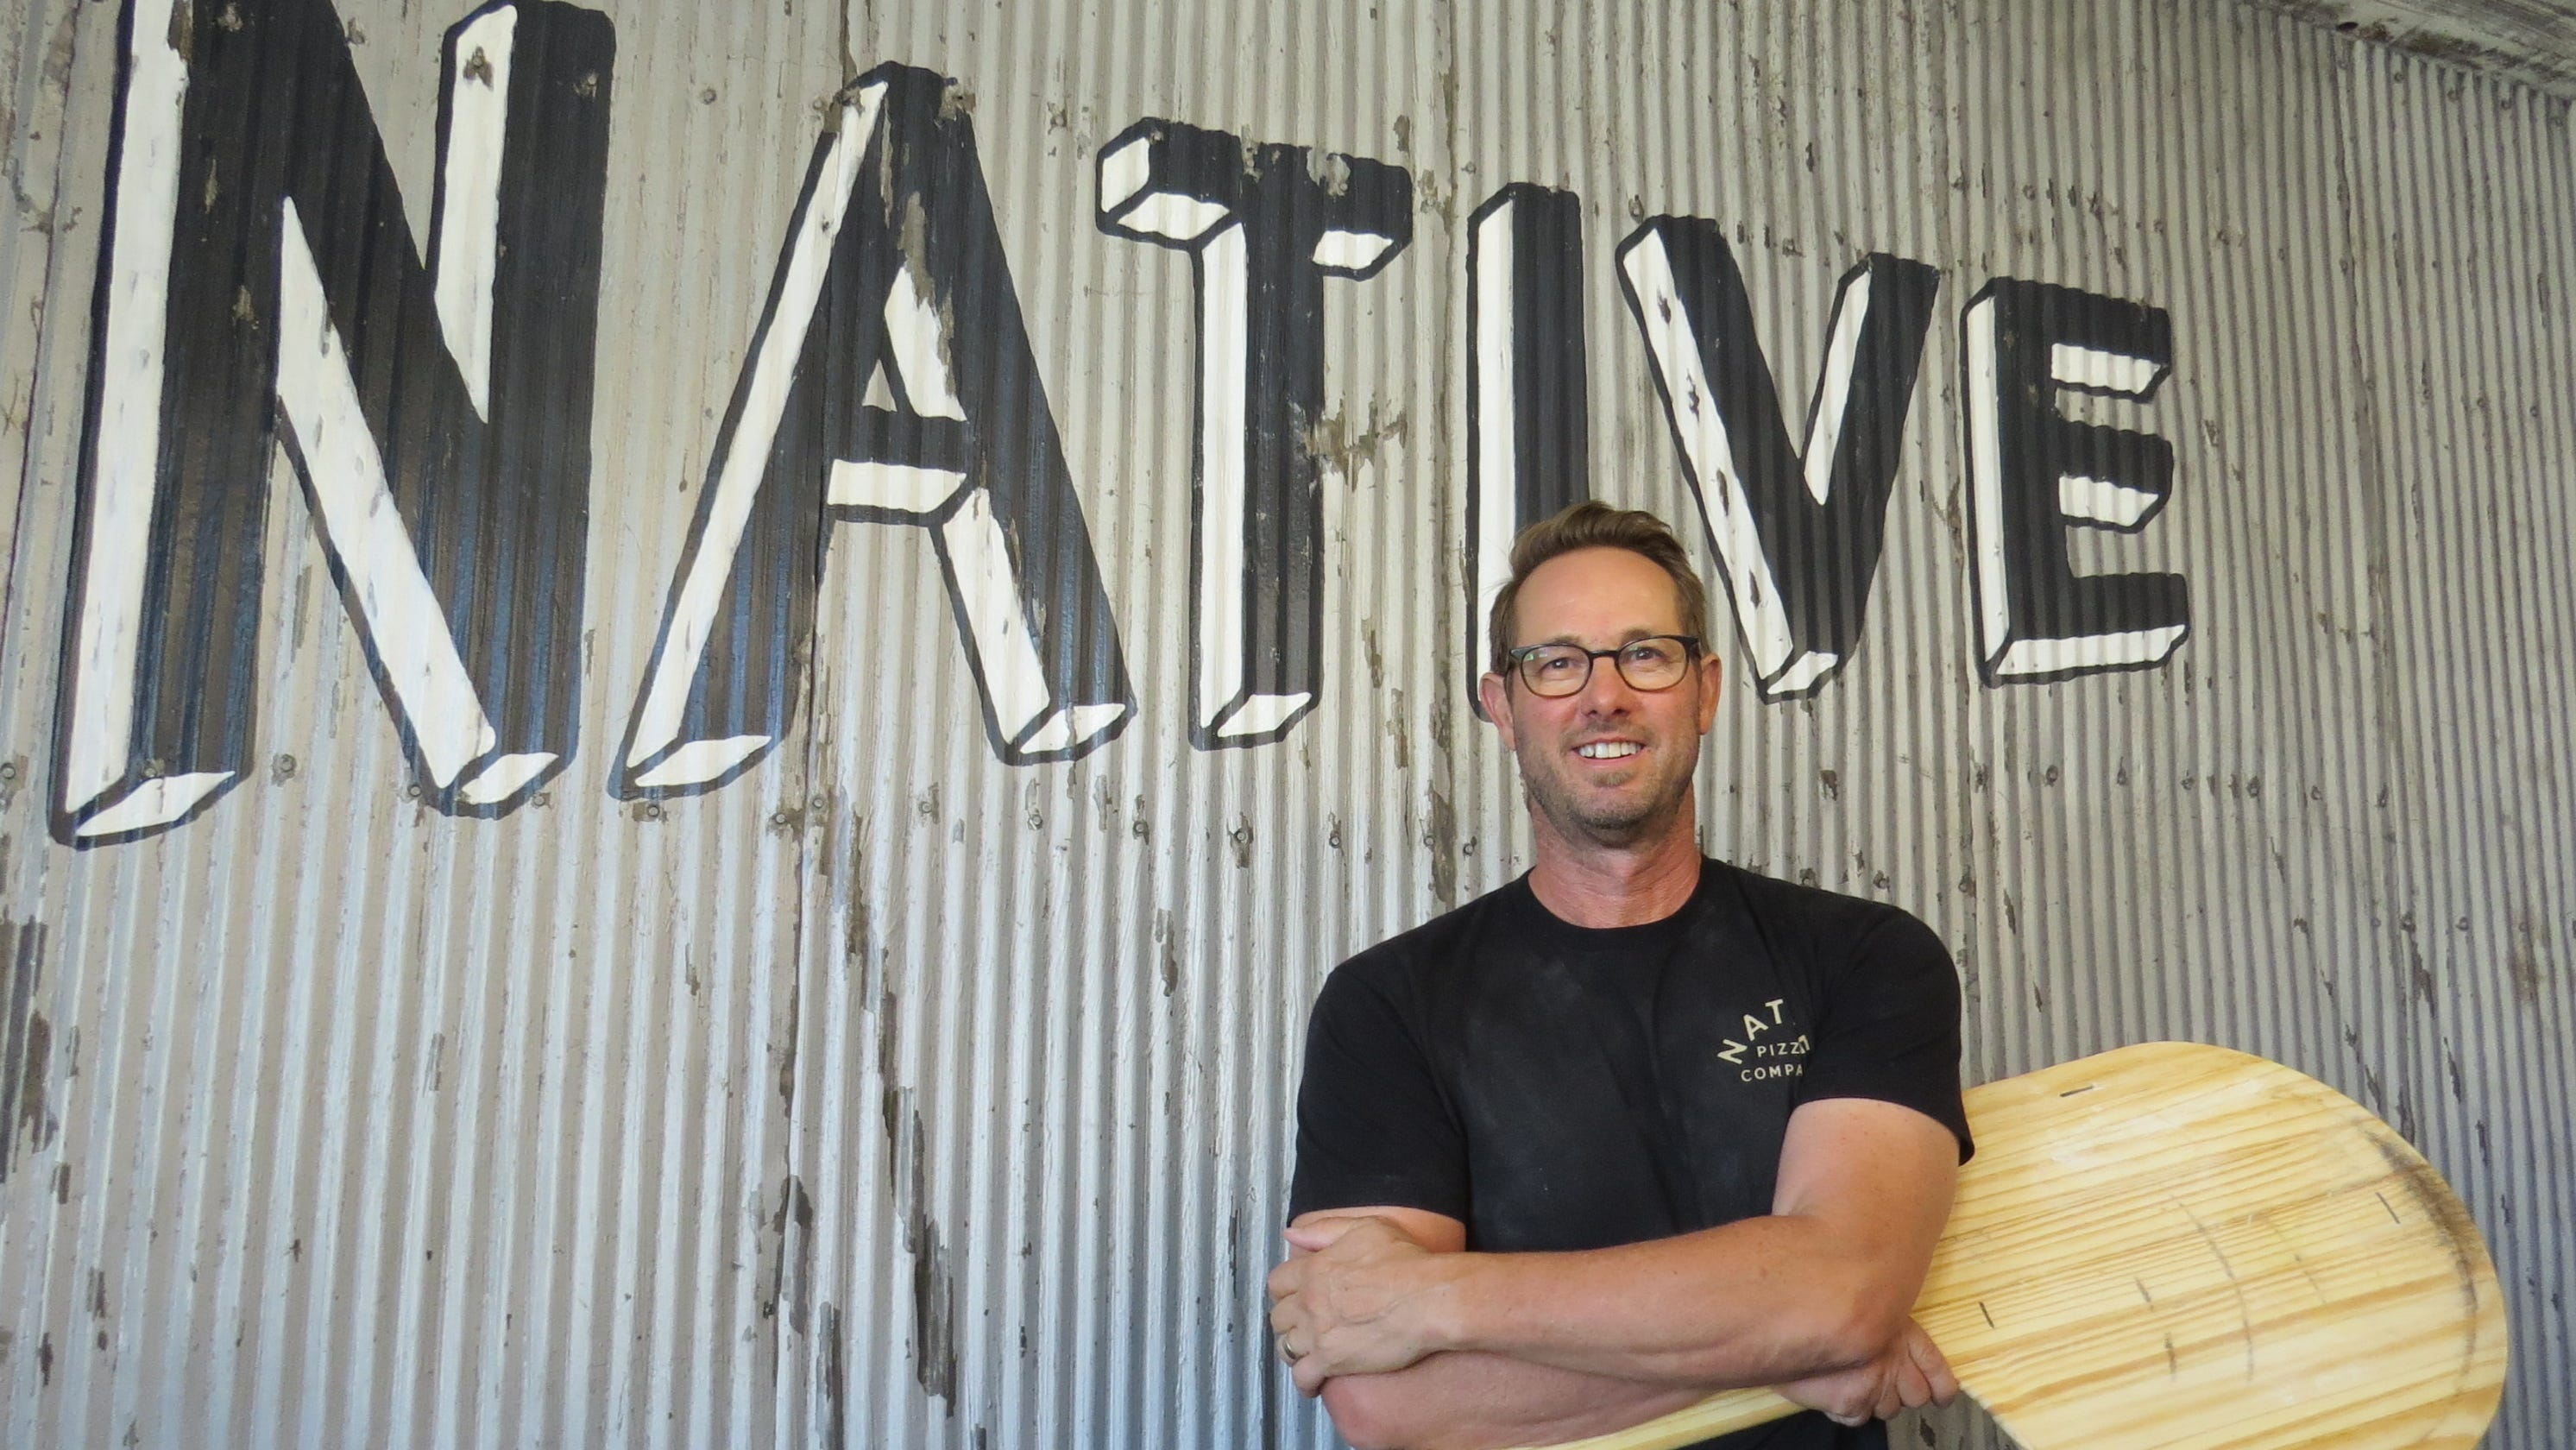 Native Pizza brings The Urban Oven's Scott Tremonti to midtown Ventura